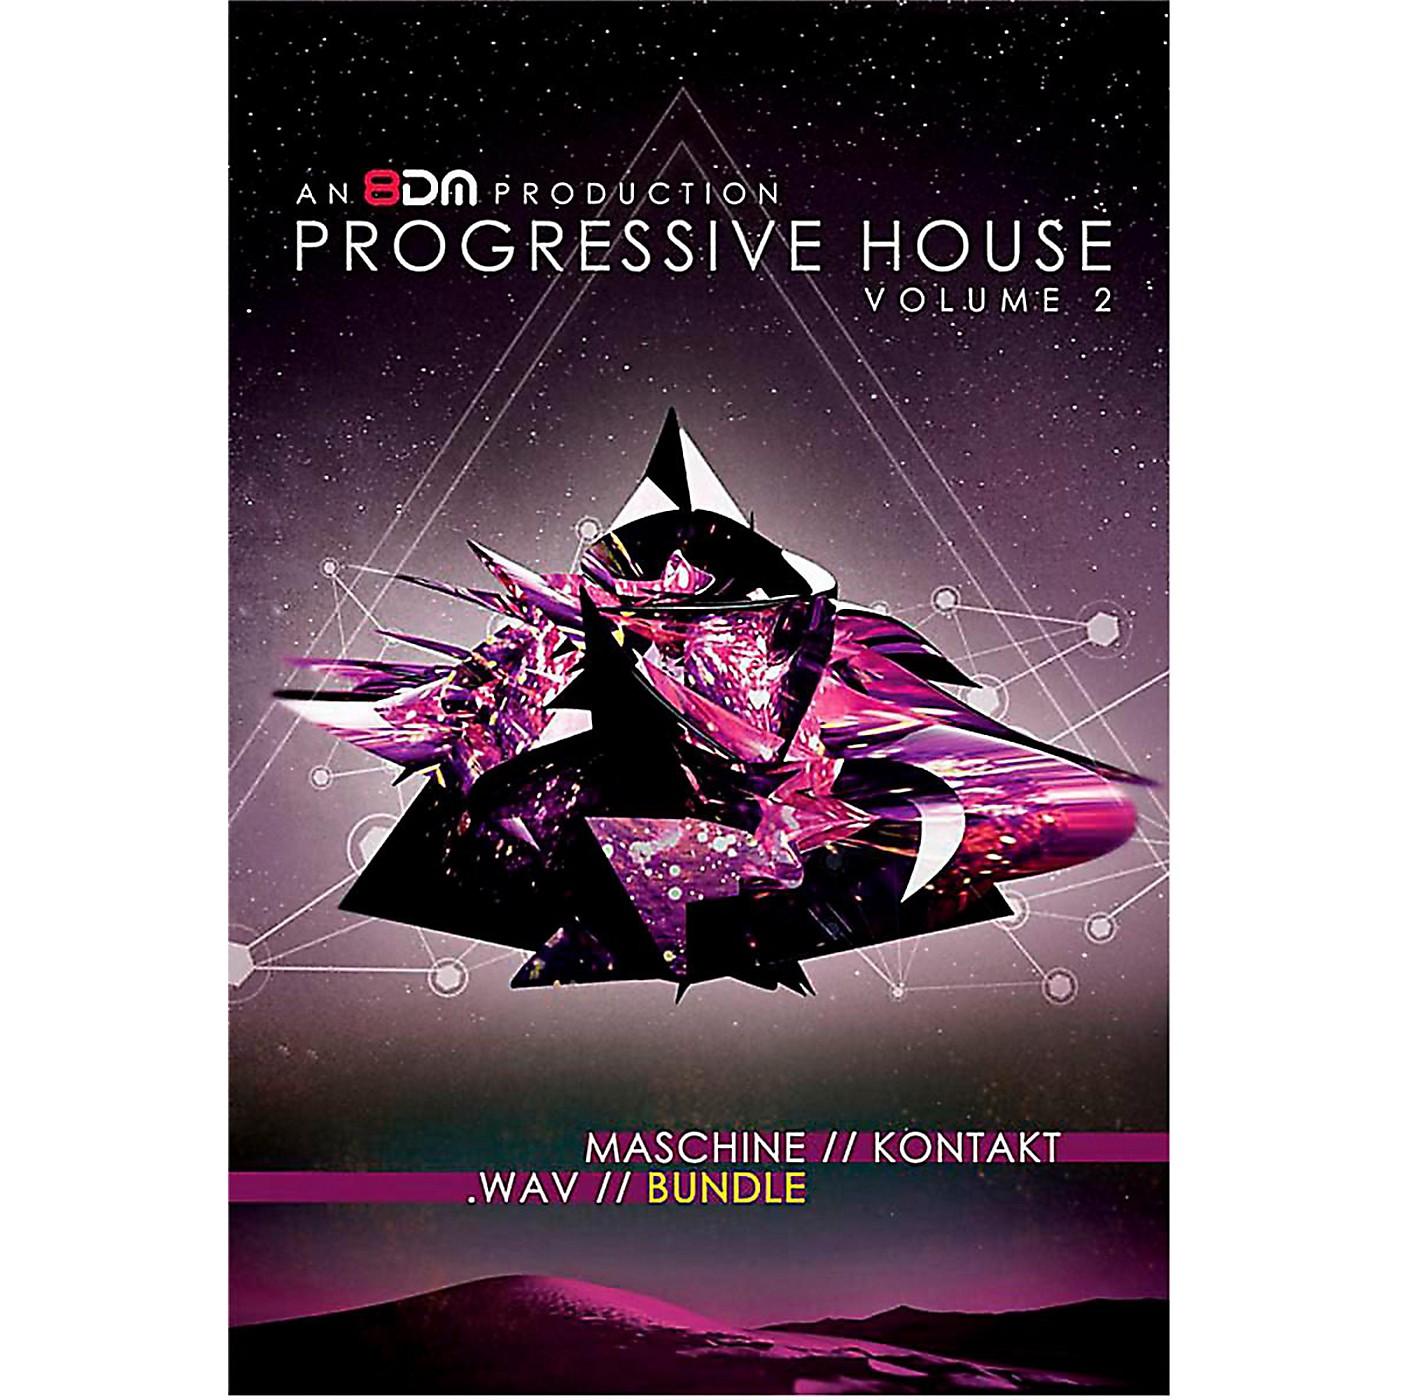 8DM Progressive House Vol 2 Bundle (Wav/Kontakt/Maschine) thumbnail